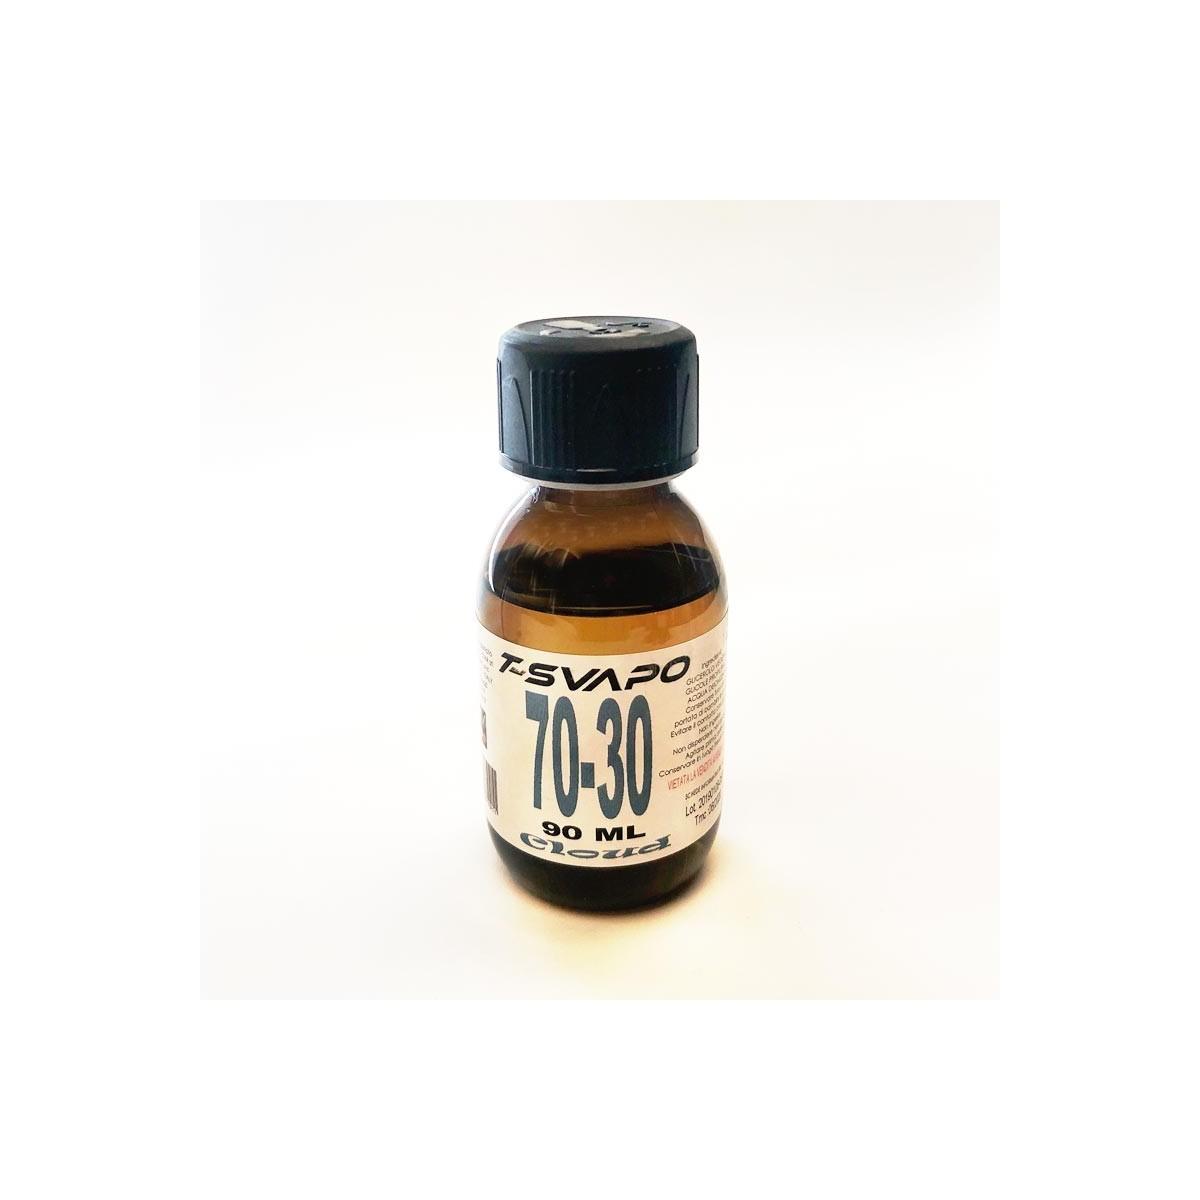 Base Cloud 70/30 90ml  T-Svapo - Senza nicotina